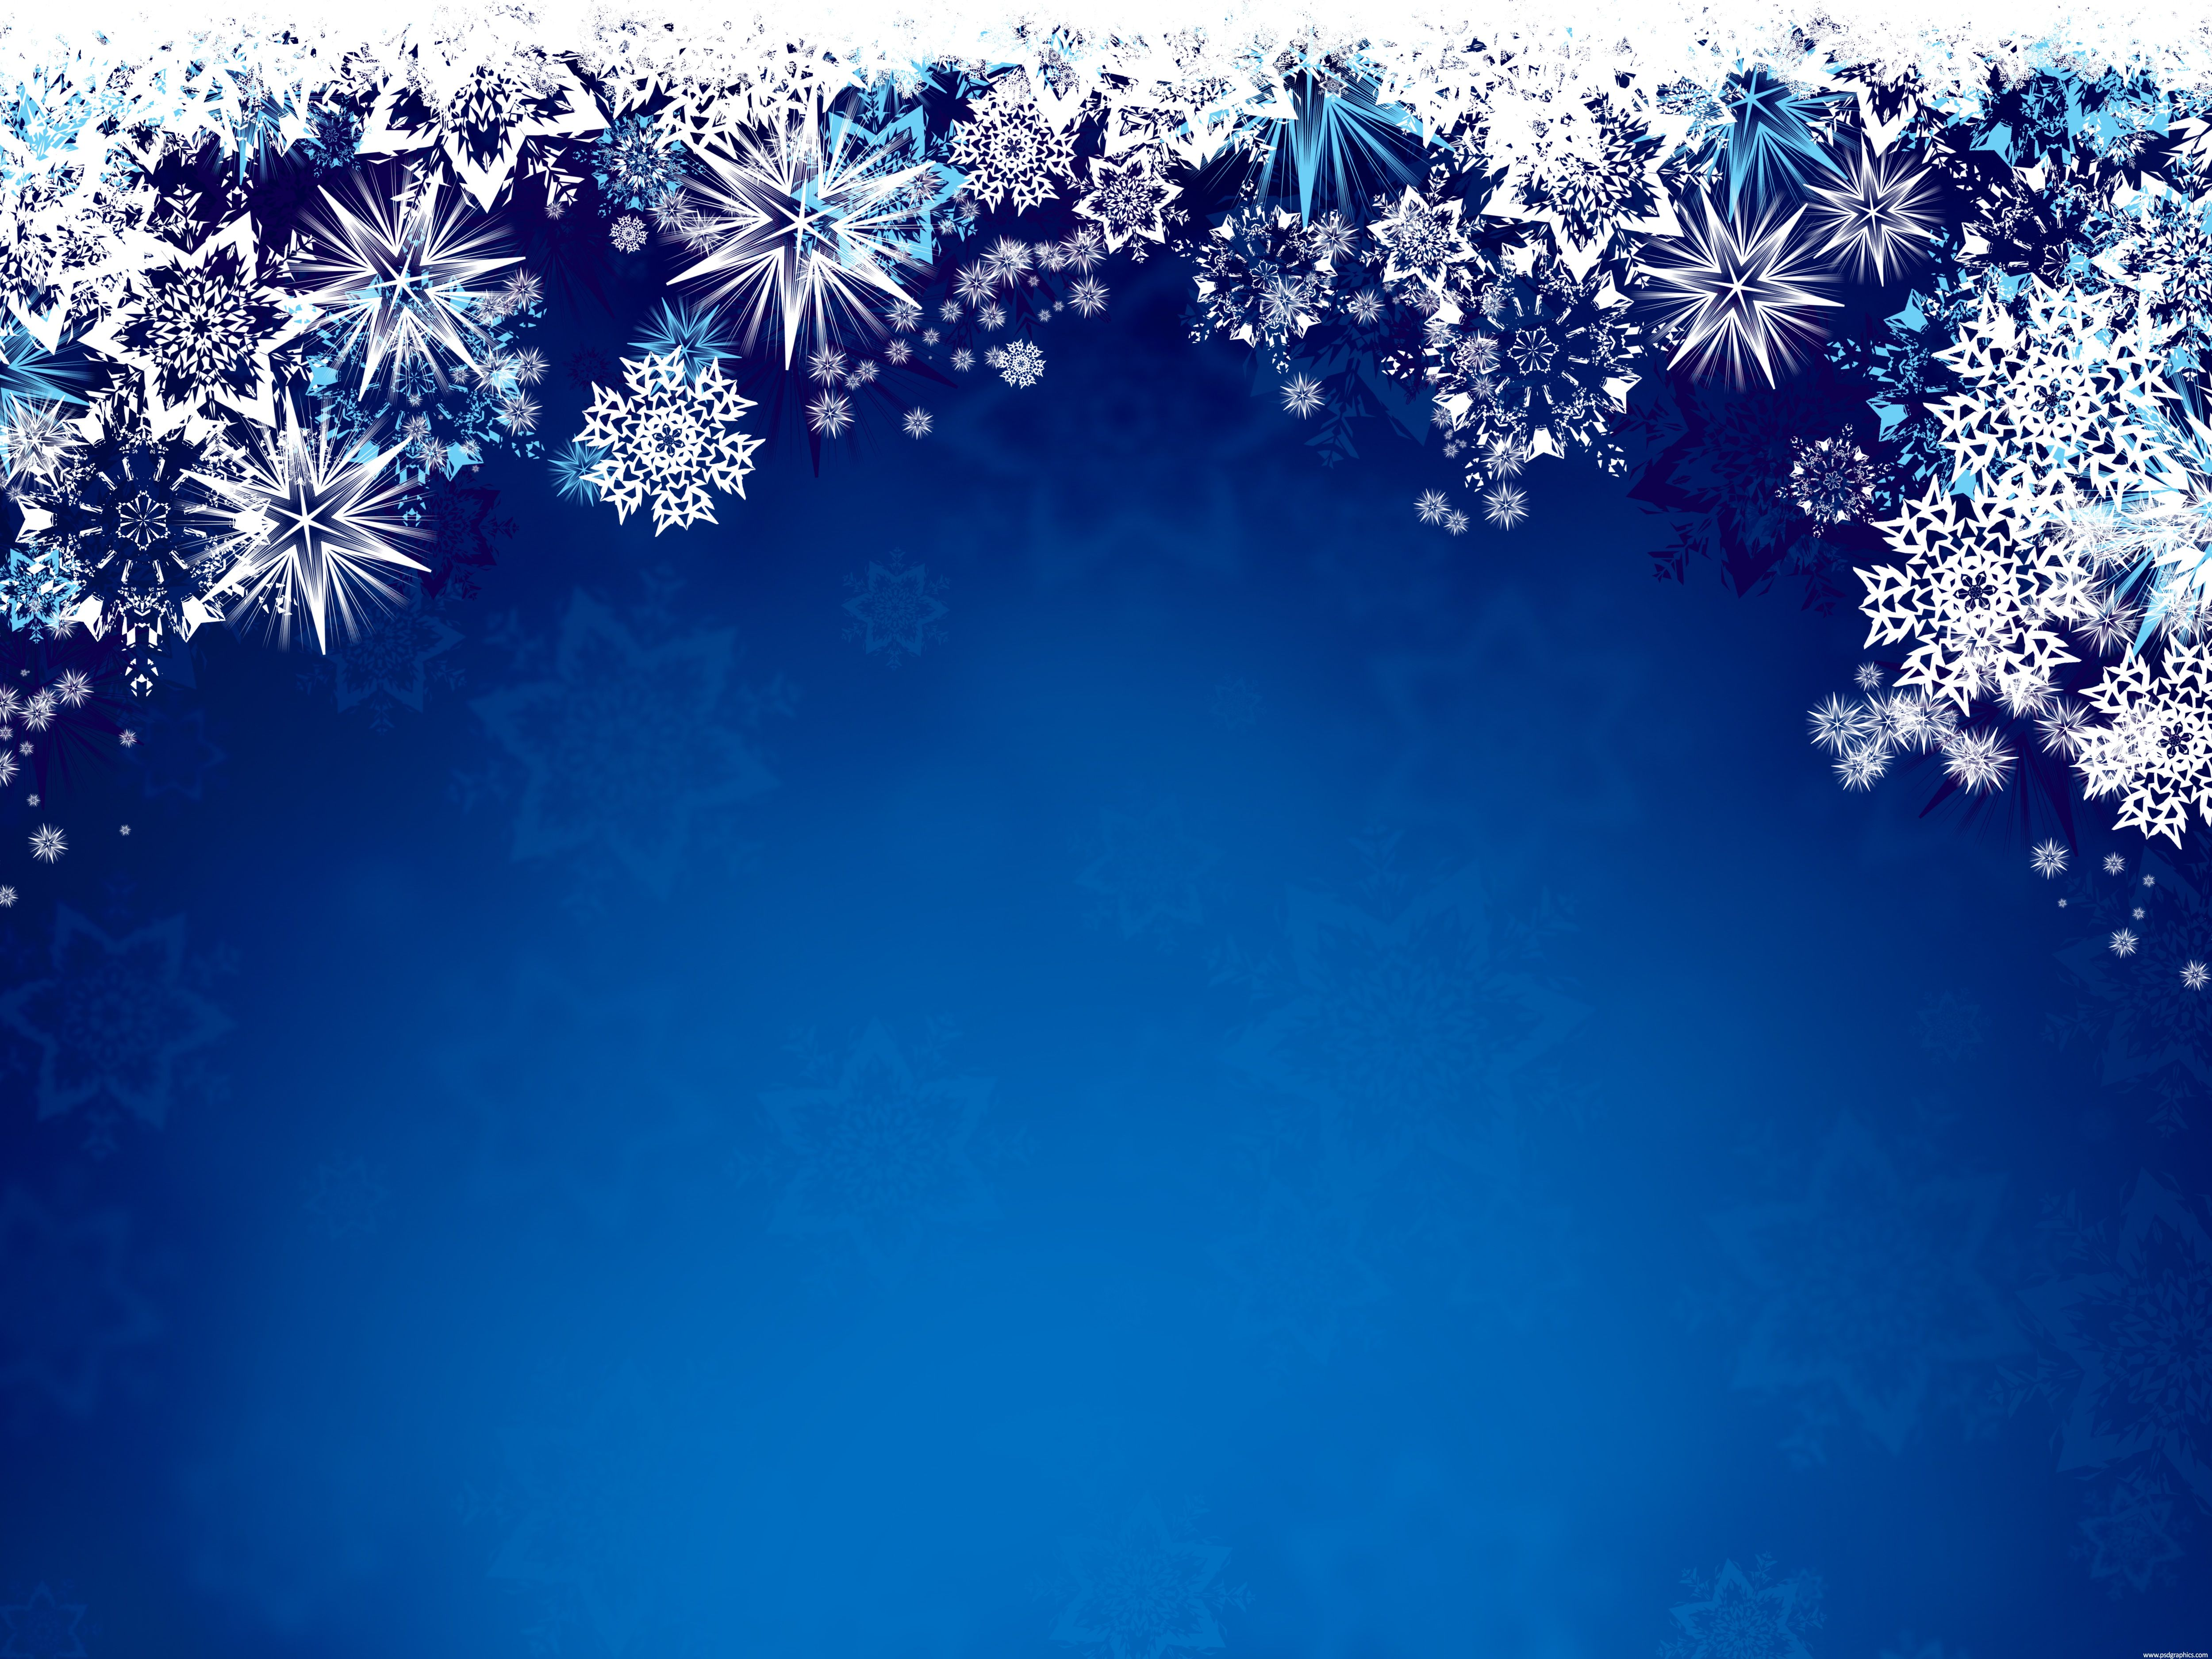 Blue Winter magic winter snowflakes grungy winter design